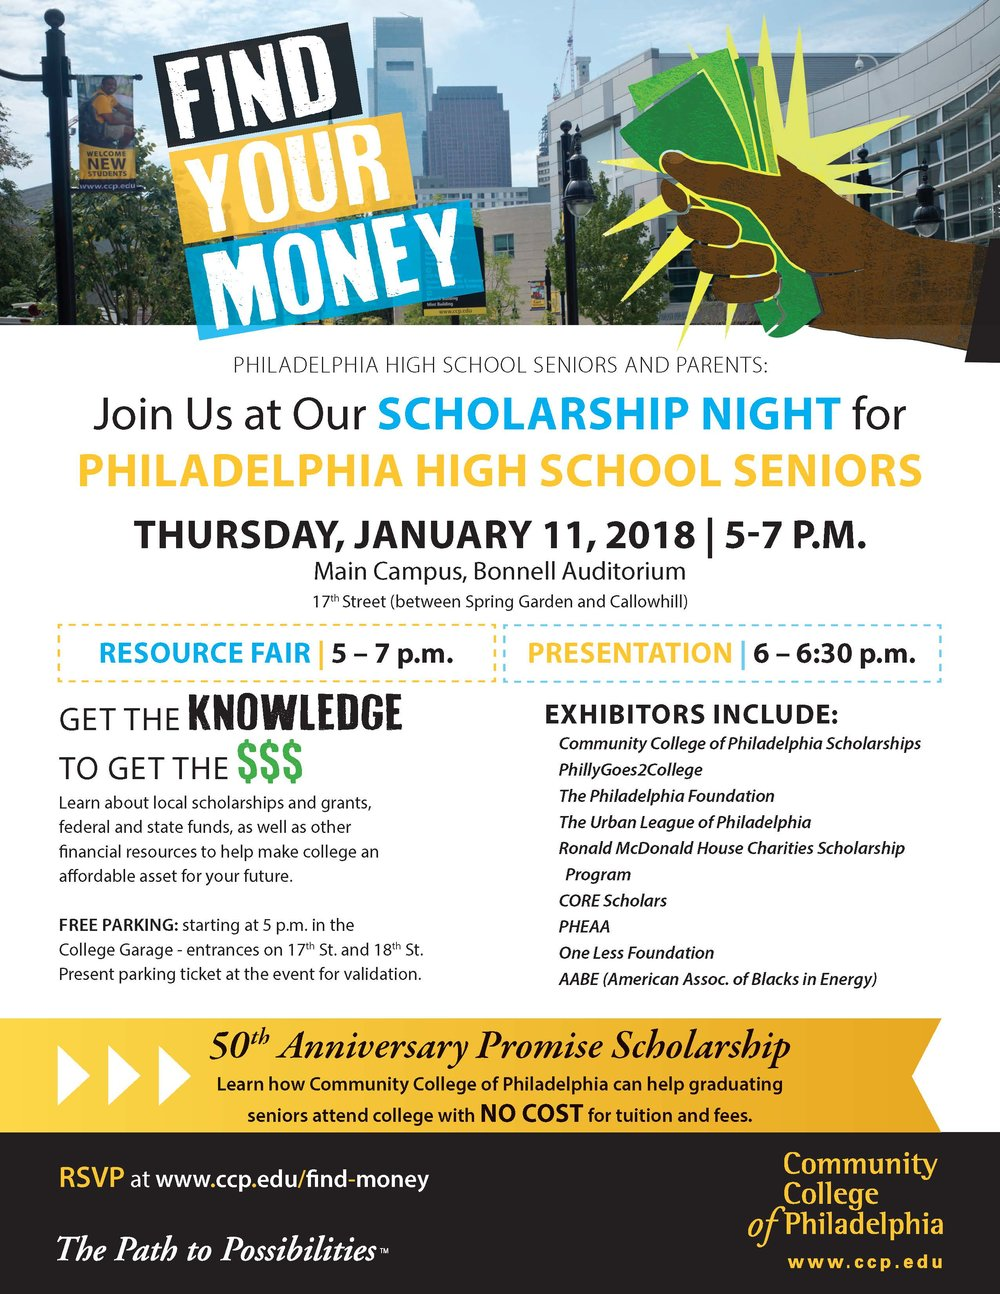 ScholarshipNightFlyer_2017.jpg